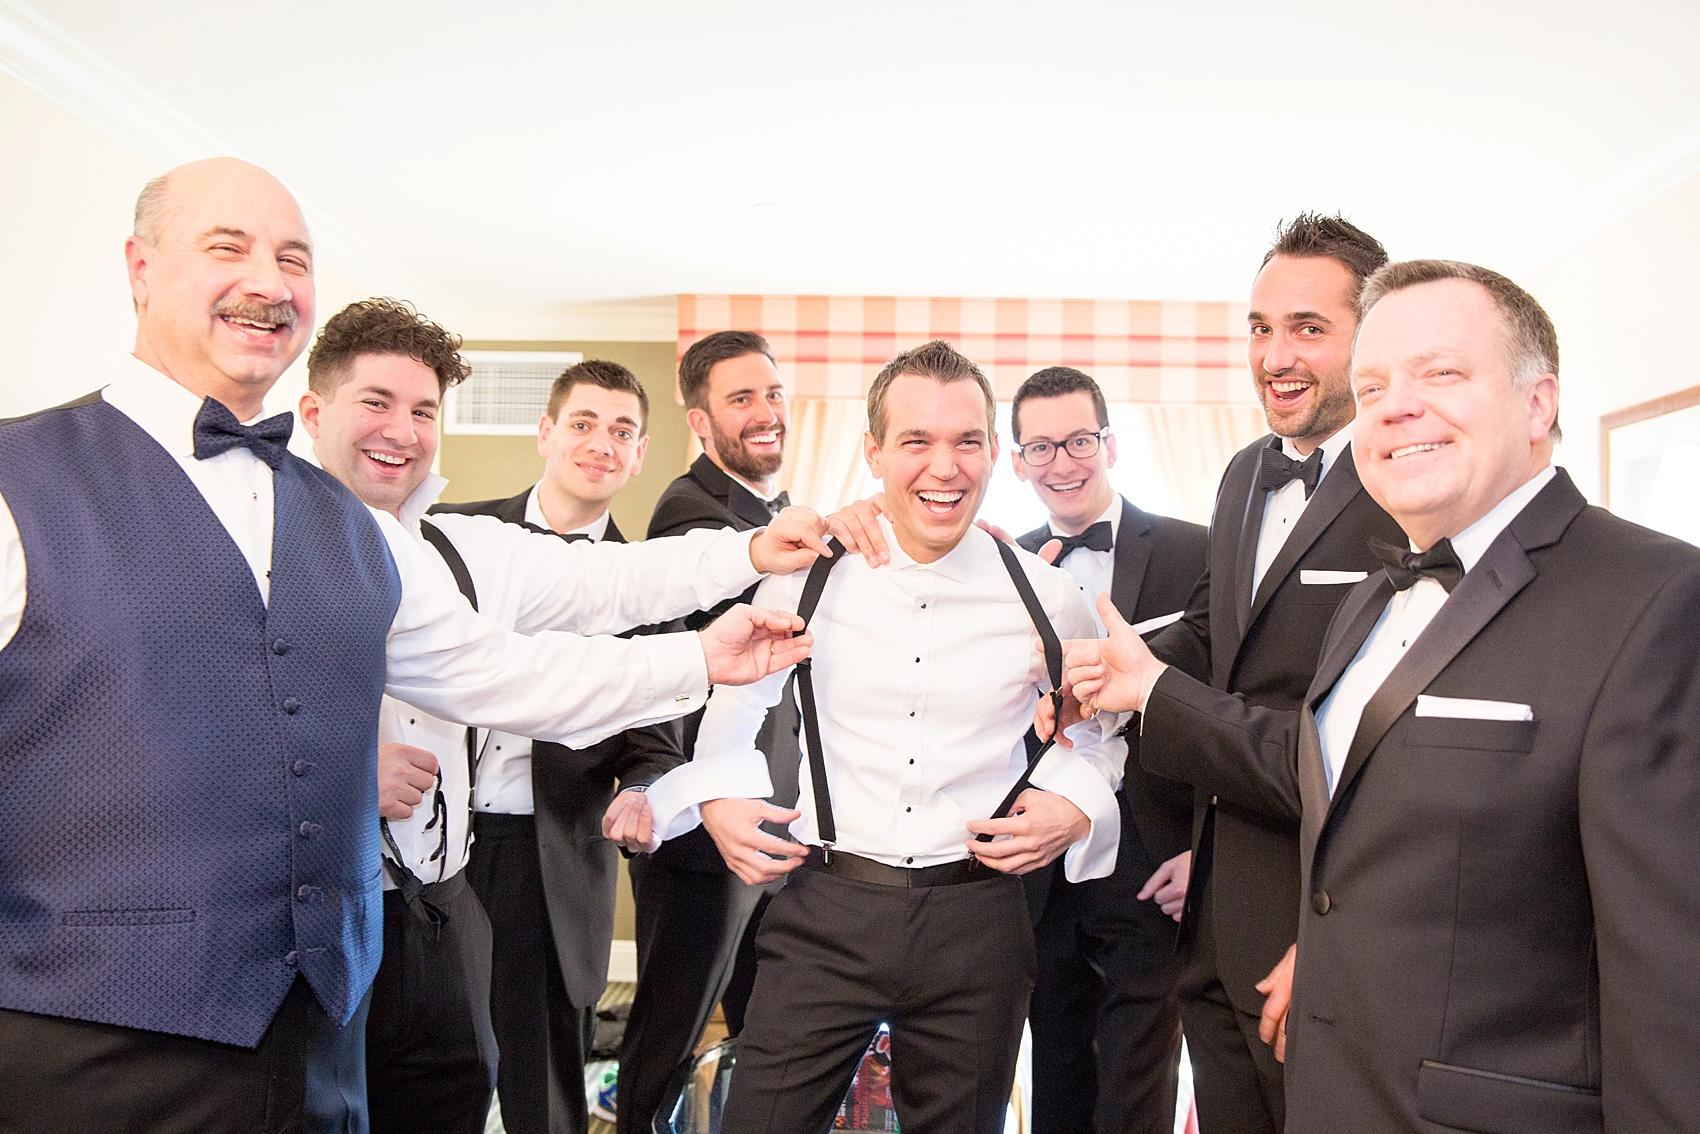 mikkelpaige-harbor_club_long_island-wedding_photographer-jen_dave_0008